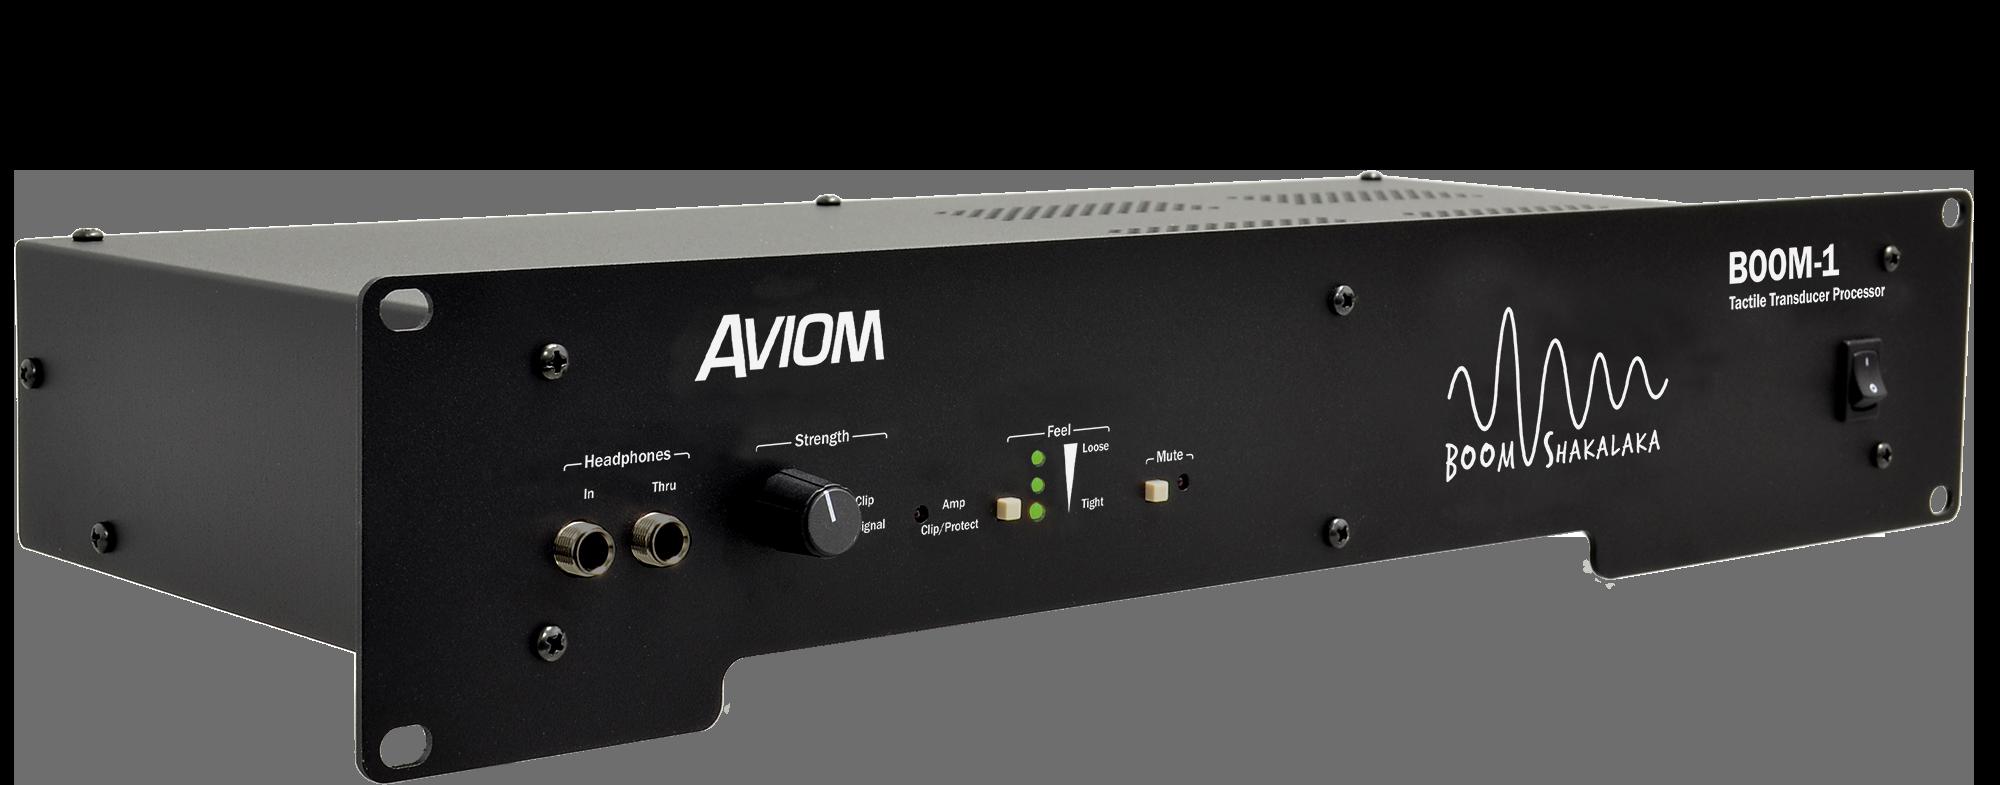 Aviom Products Boom 1 Tactile Transducer Processor